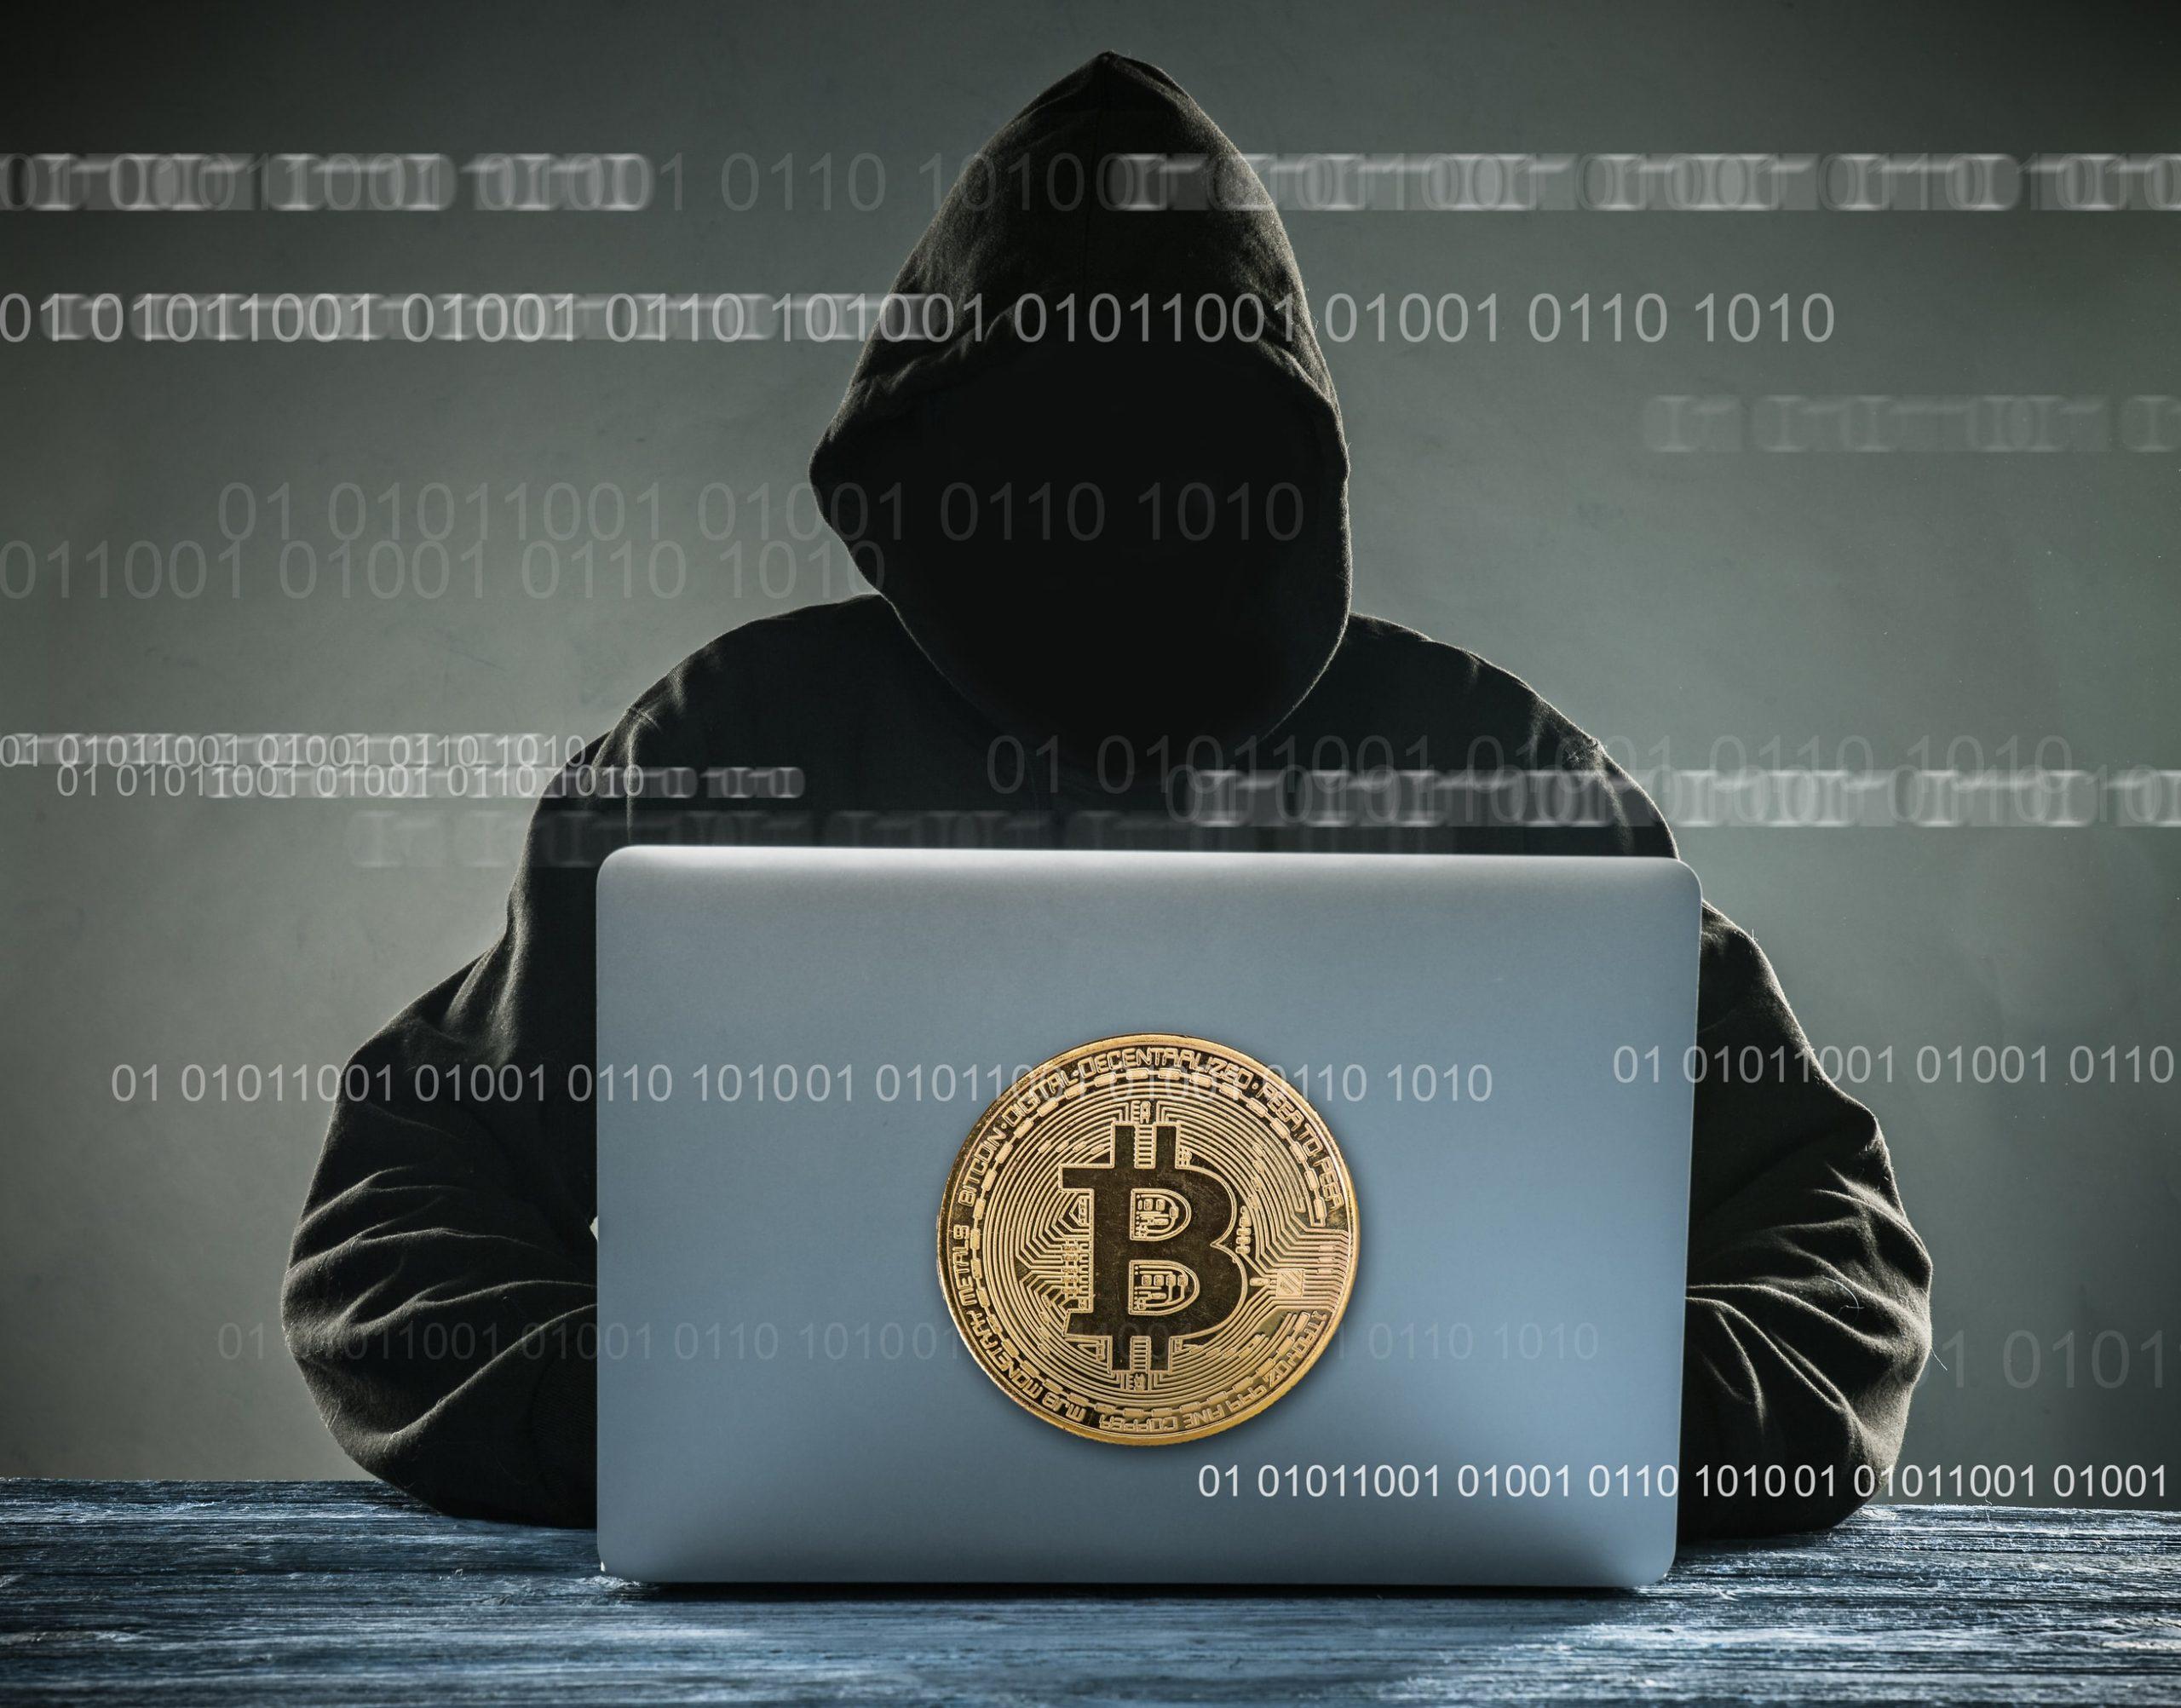 BTC anonym